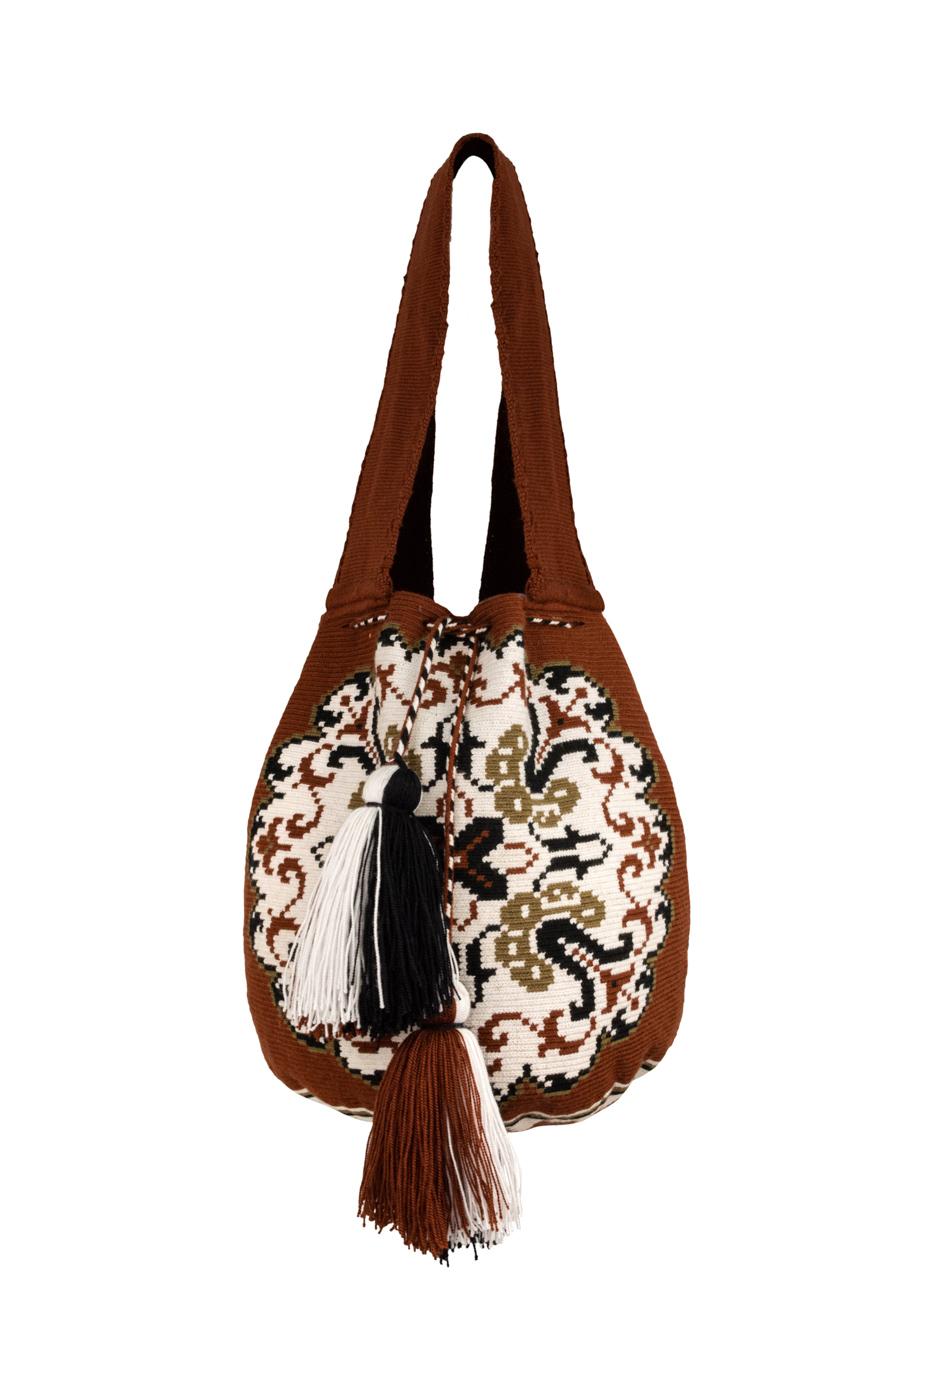 Mochila Wayuu Diseño Mandala Marrón